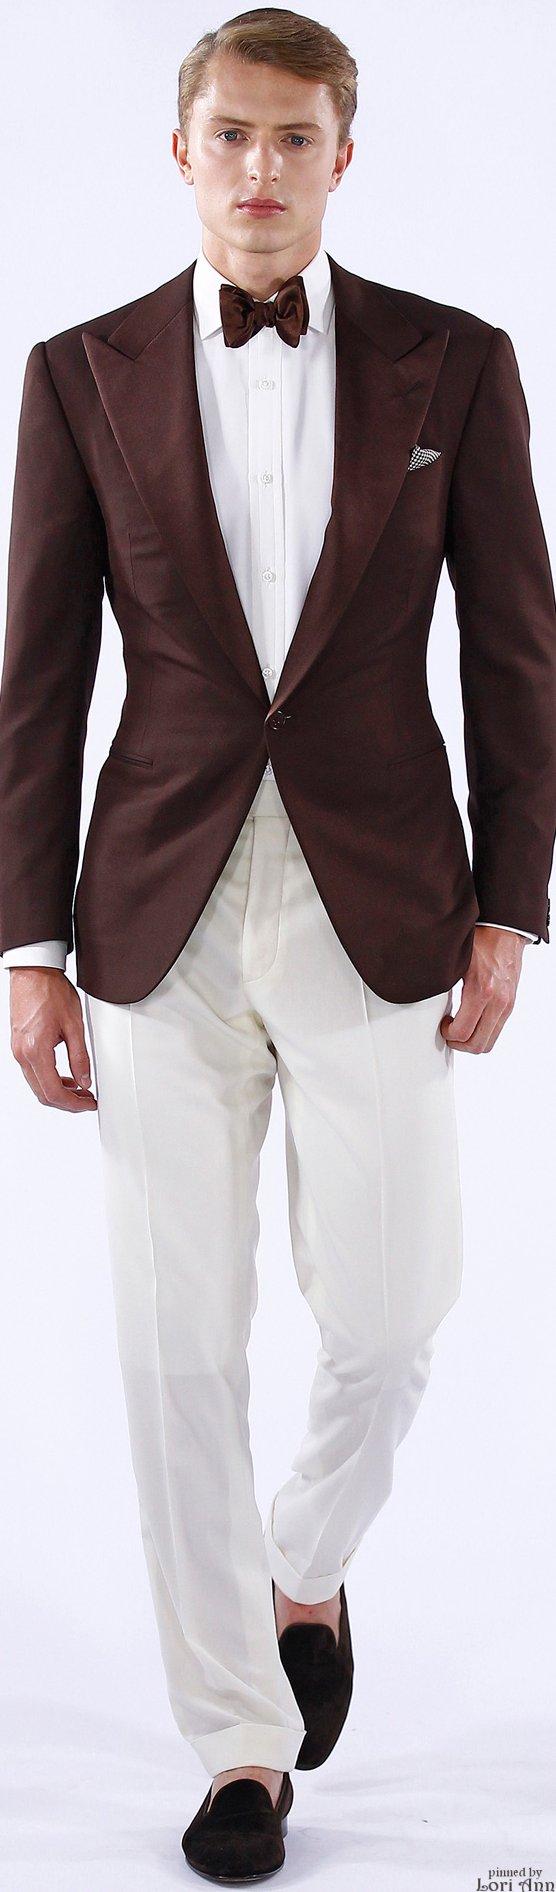 Ralph Lauren Spring 2016 | Men's Fashion | Menswear | Stylish and Sophisticated | Moda Masculina | Shop at designerclothingfans.com